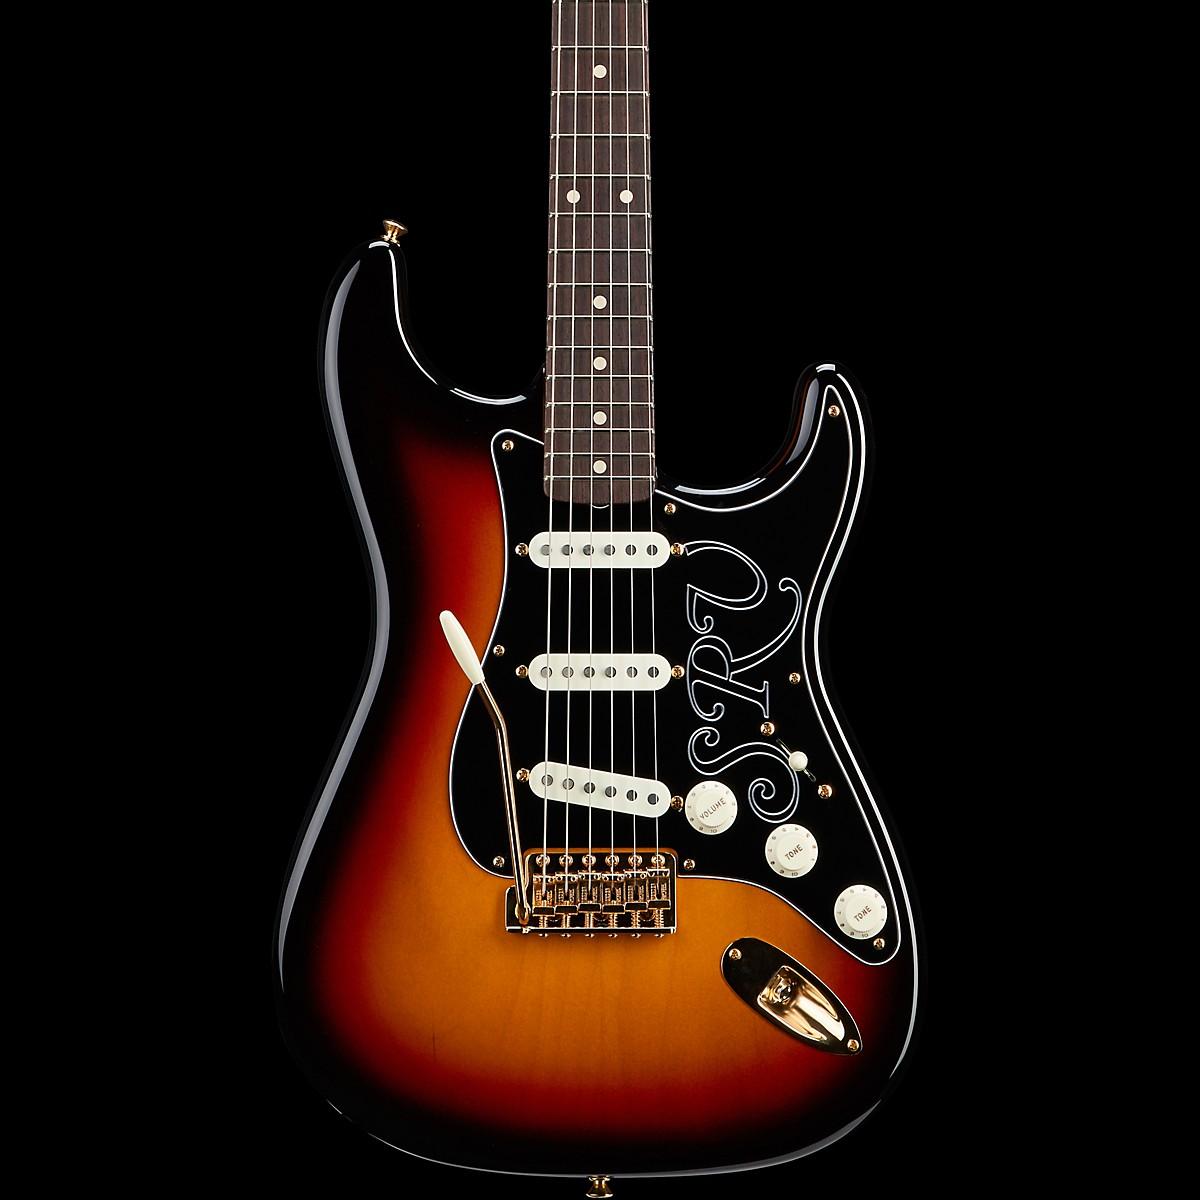 Fender Custom Shop Stevie Ray Vaughan Signature Series Stratocaster NOS Pau Ferro Fingerboard Electric Guitar